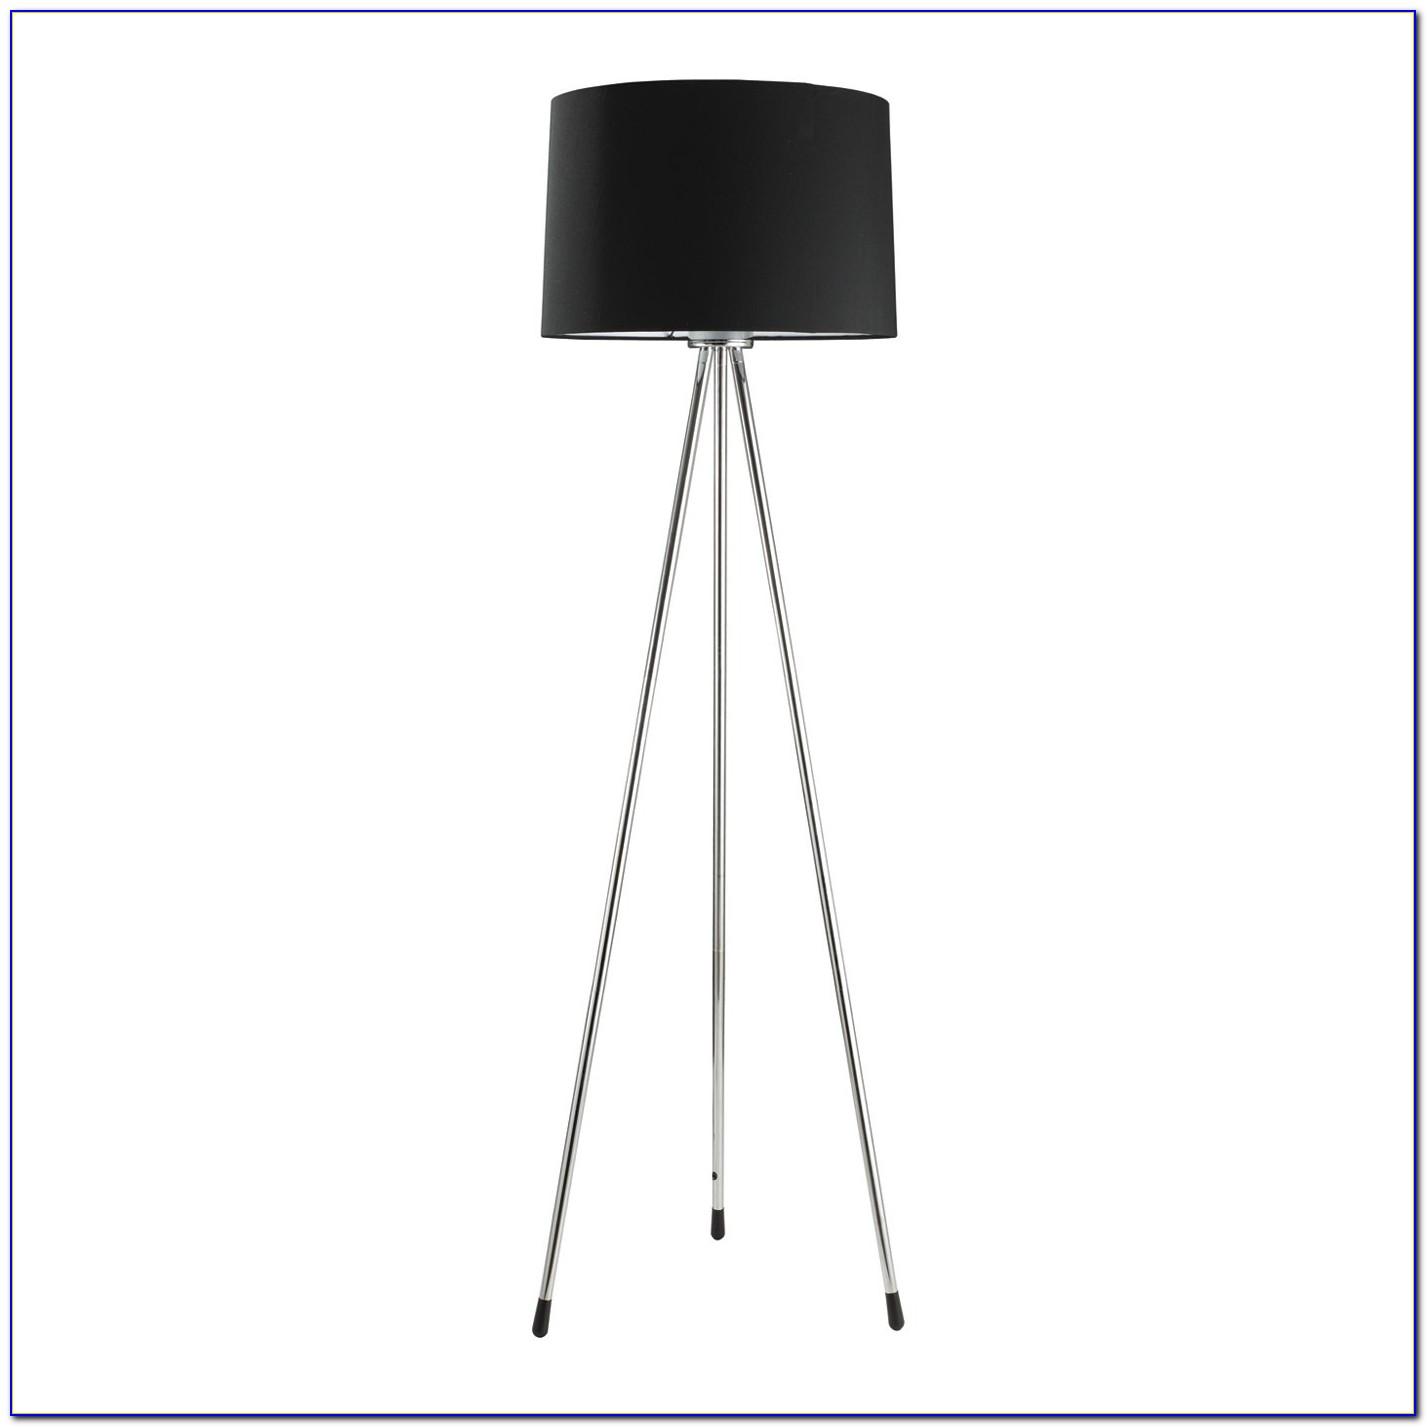 Ore International Polished Floor Lamp